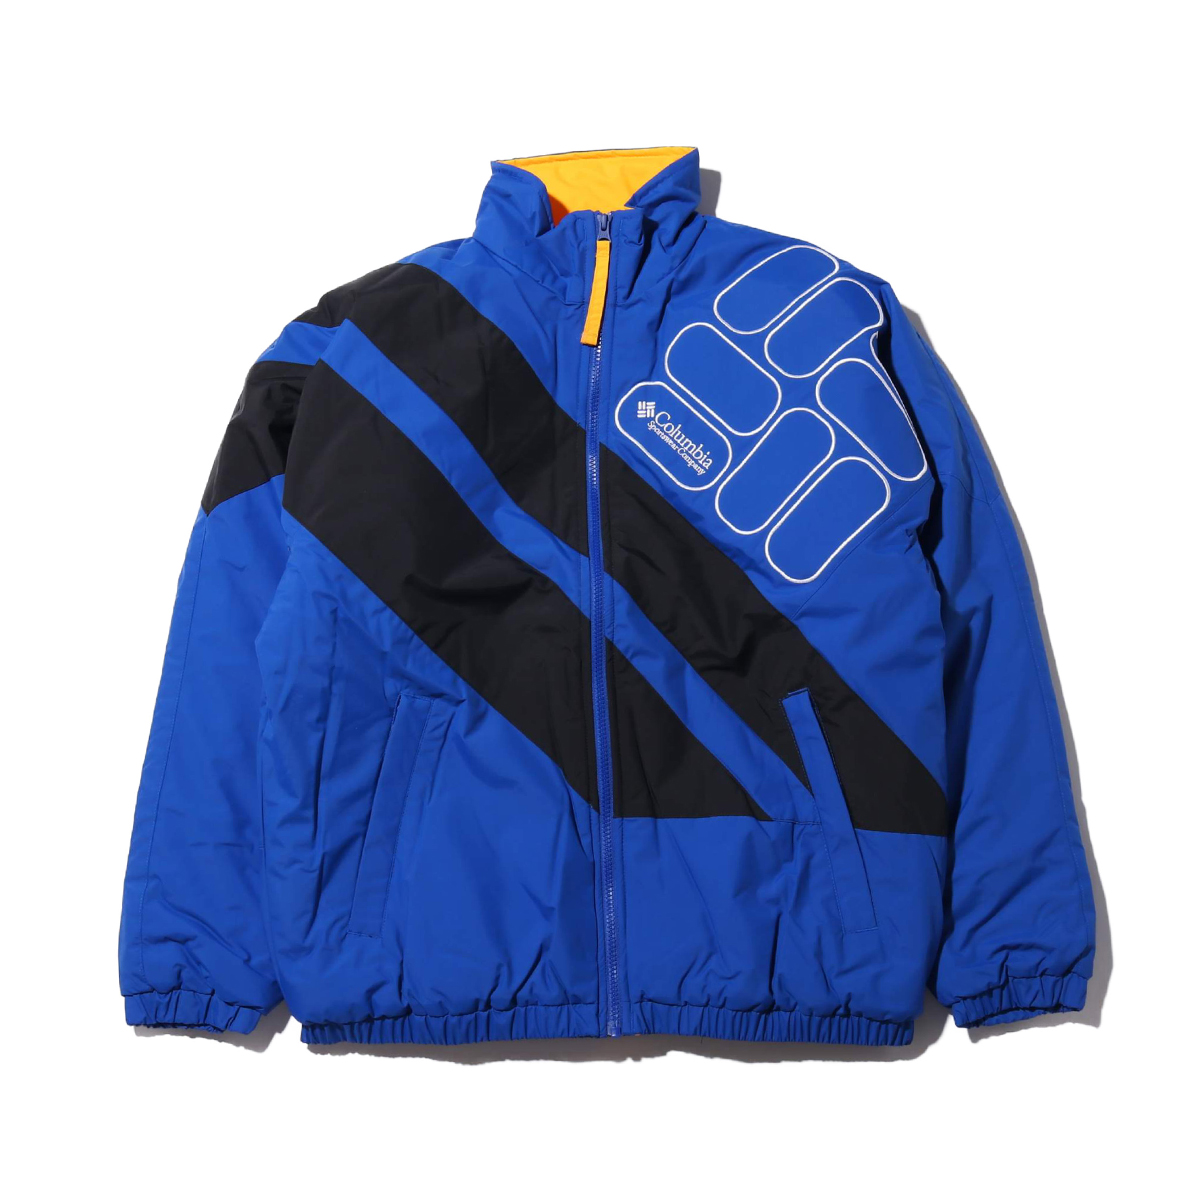 Columbia Sideline™ Parka(Azul, Black)(コロンビア サイドライン パーカー)【メンズ】【パーカー】【19FA-I】